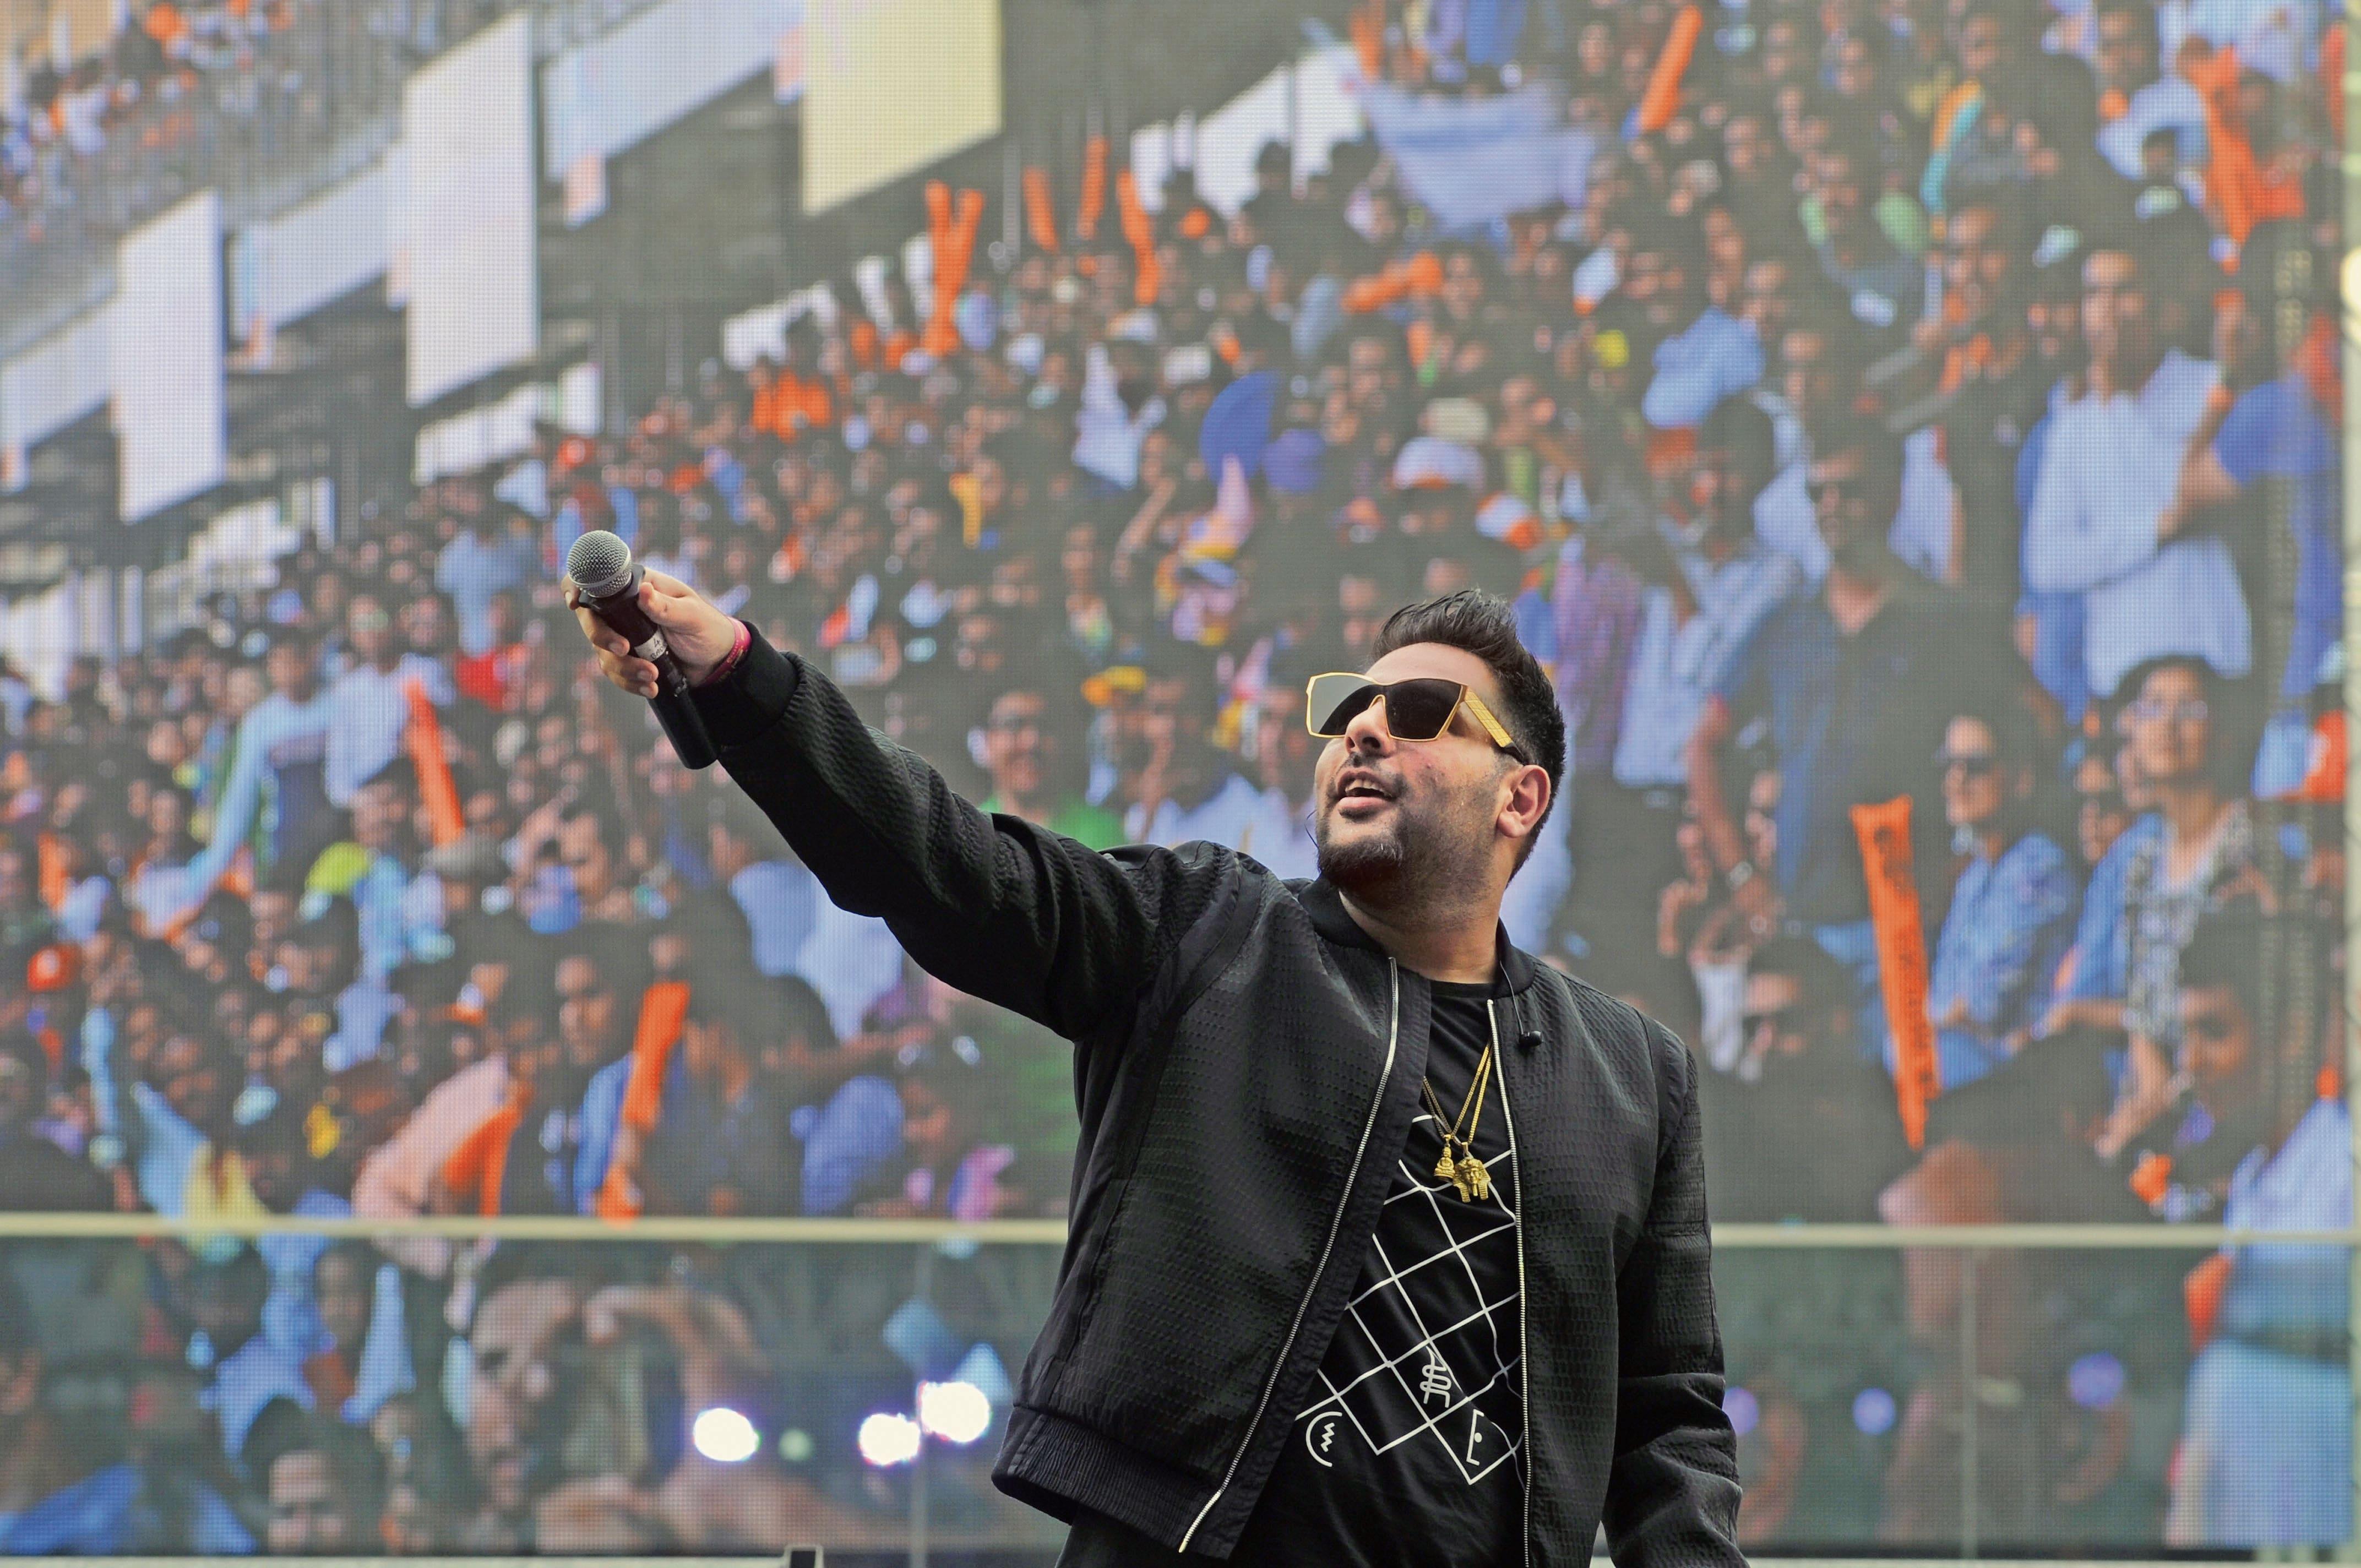 Punjabi artistes such as Badshah charge around  <span class='webrupee'>₹</span>40 lakh for a public performance.